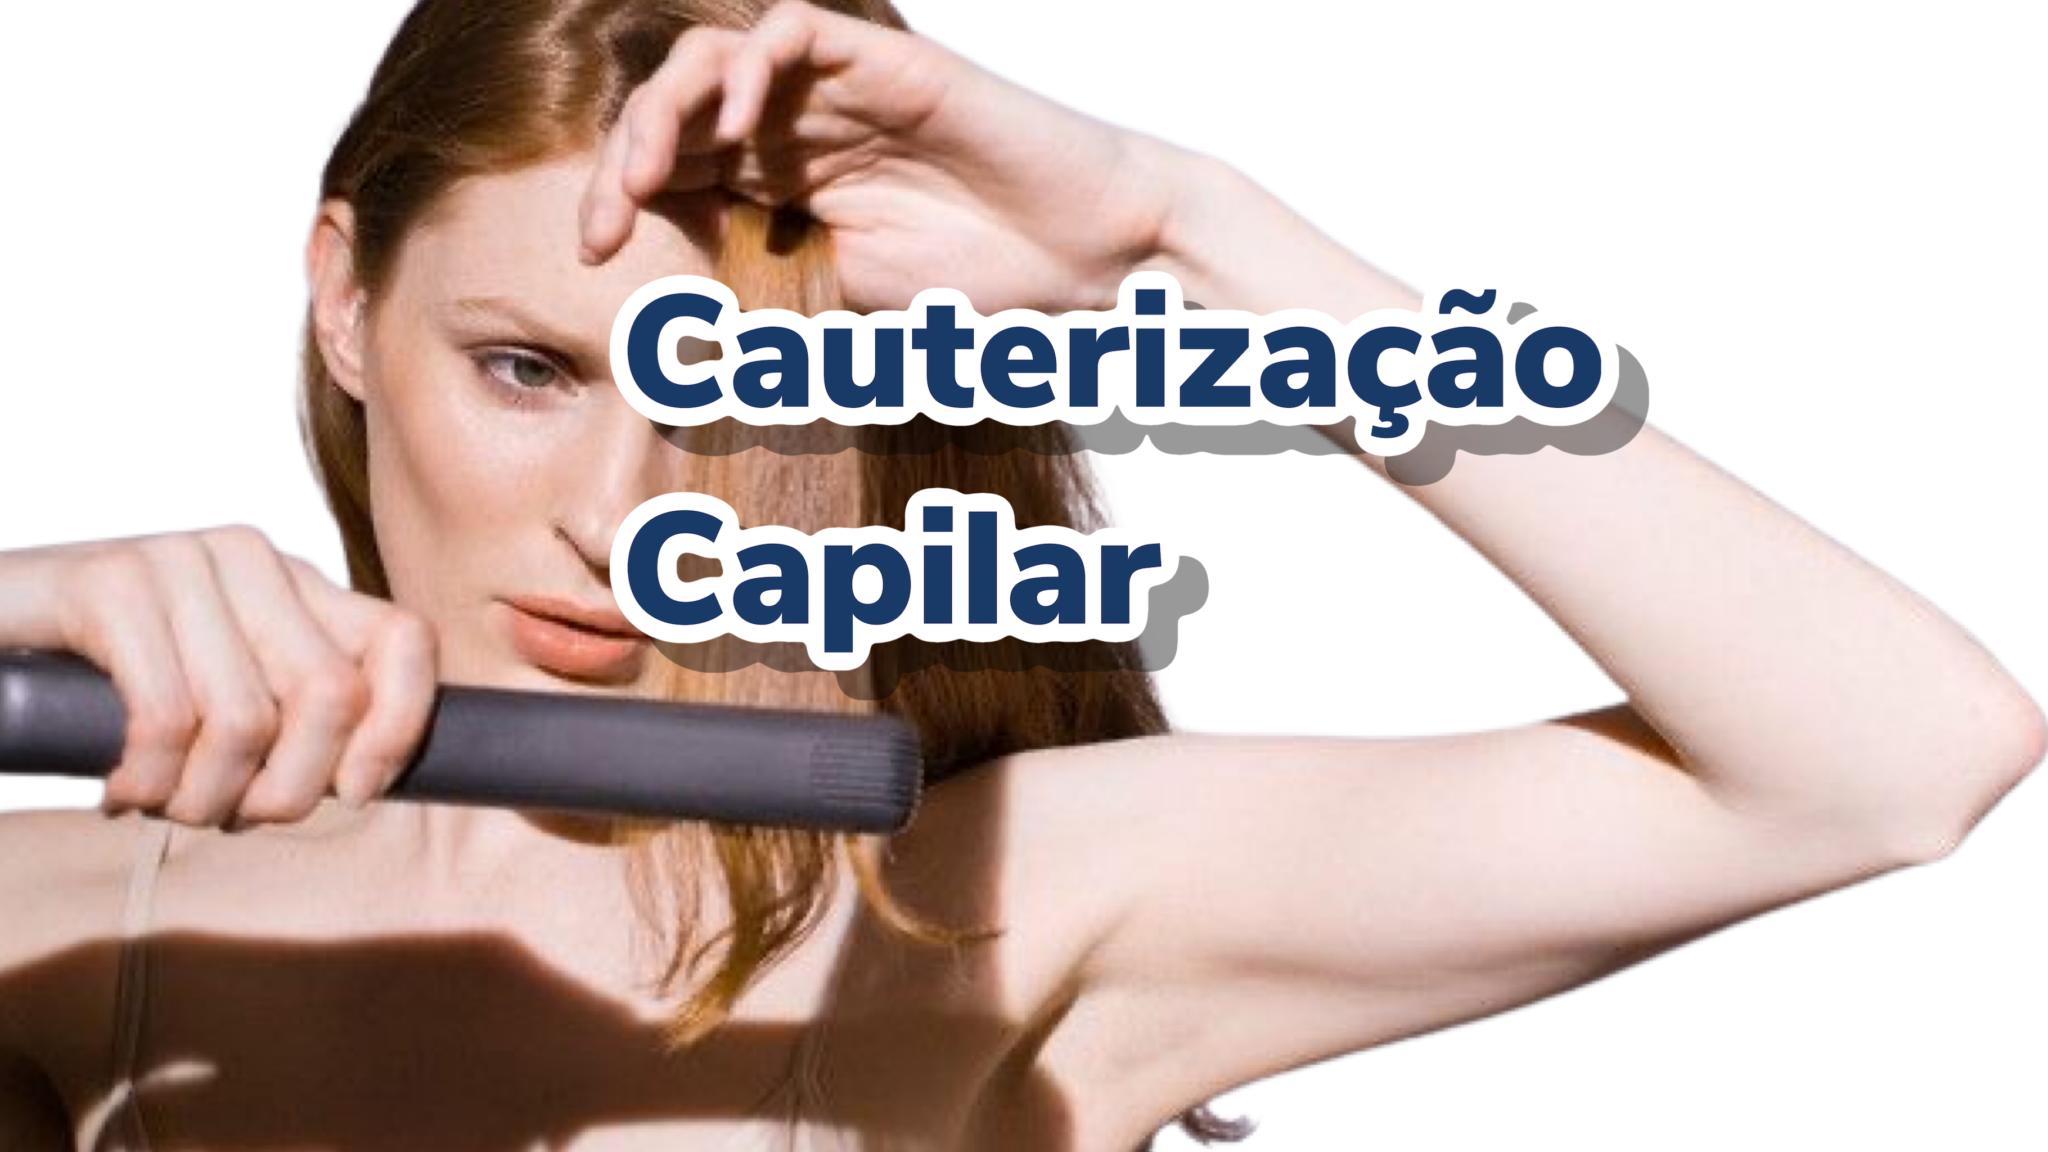 Já ouviu falar de cauterização capilar?